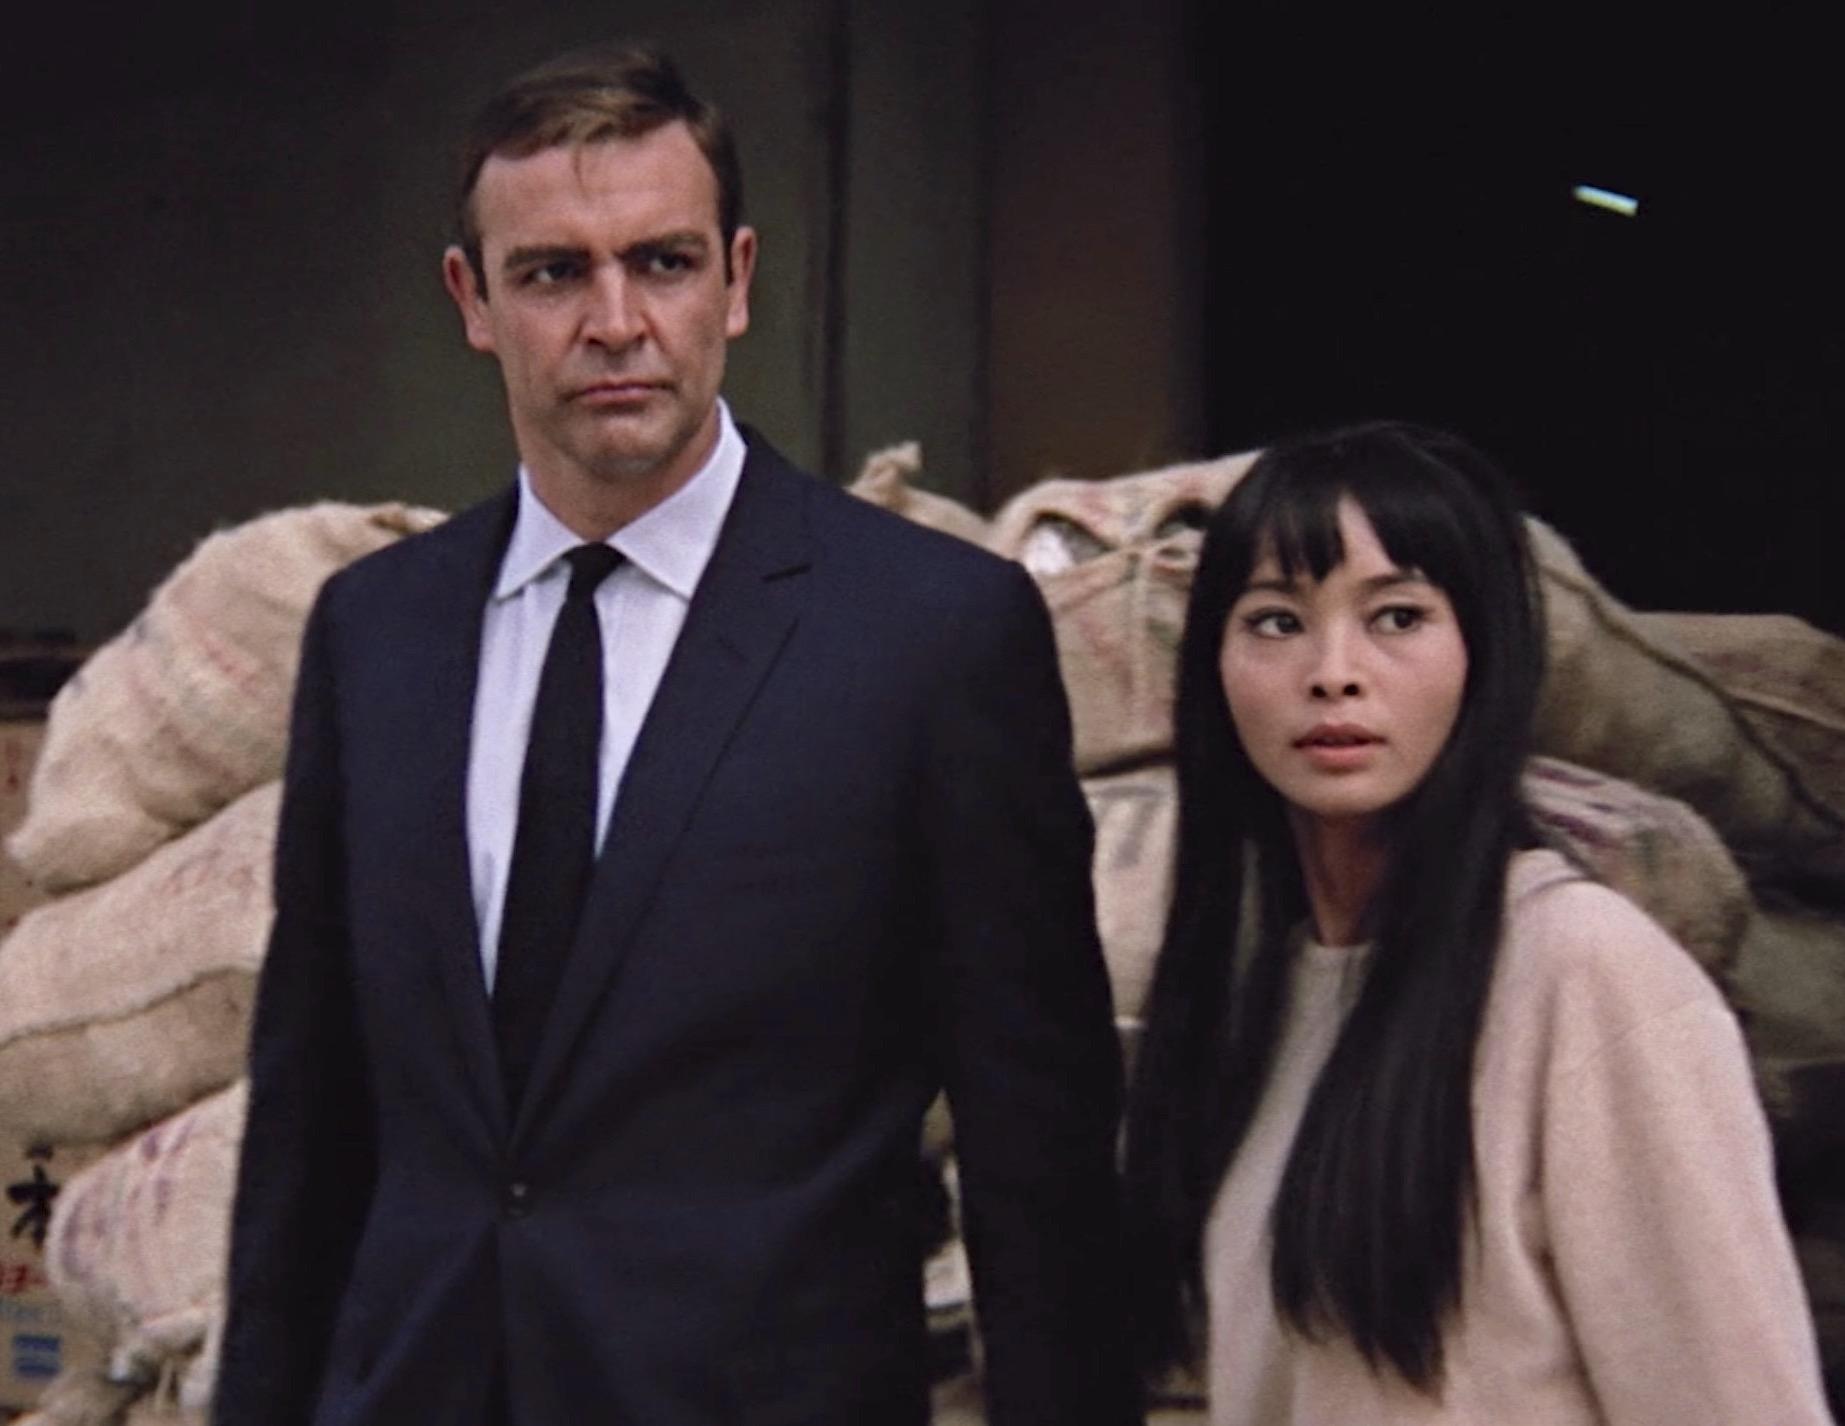 yolt3 bg flemingbond 1 20 Classic James Bond Moments That Have Aged Terribly